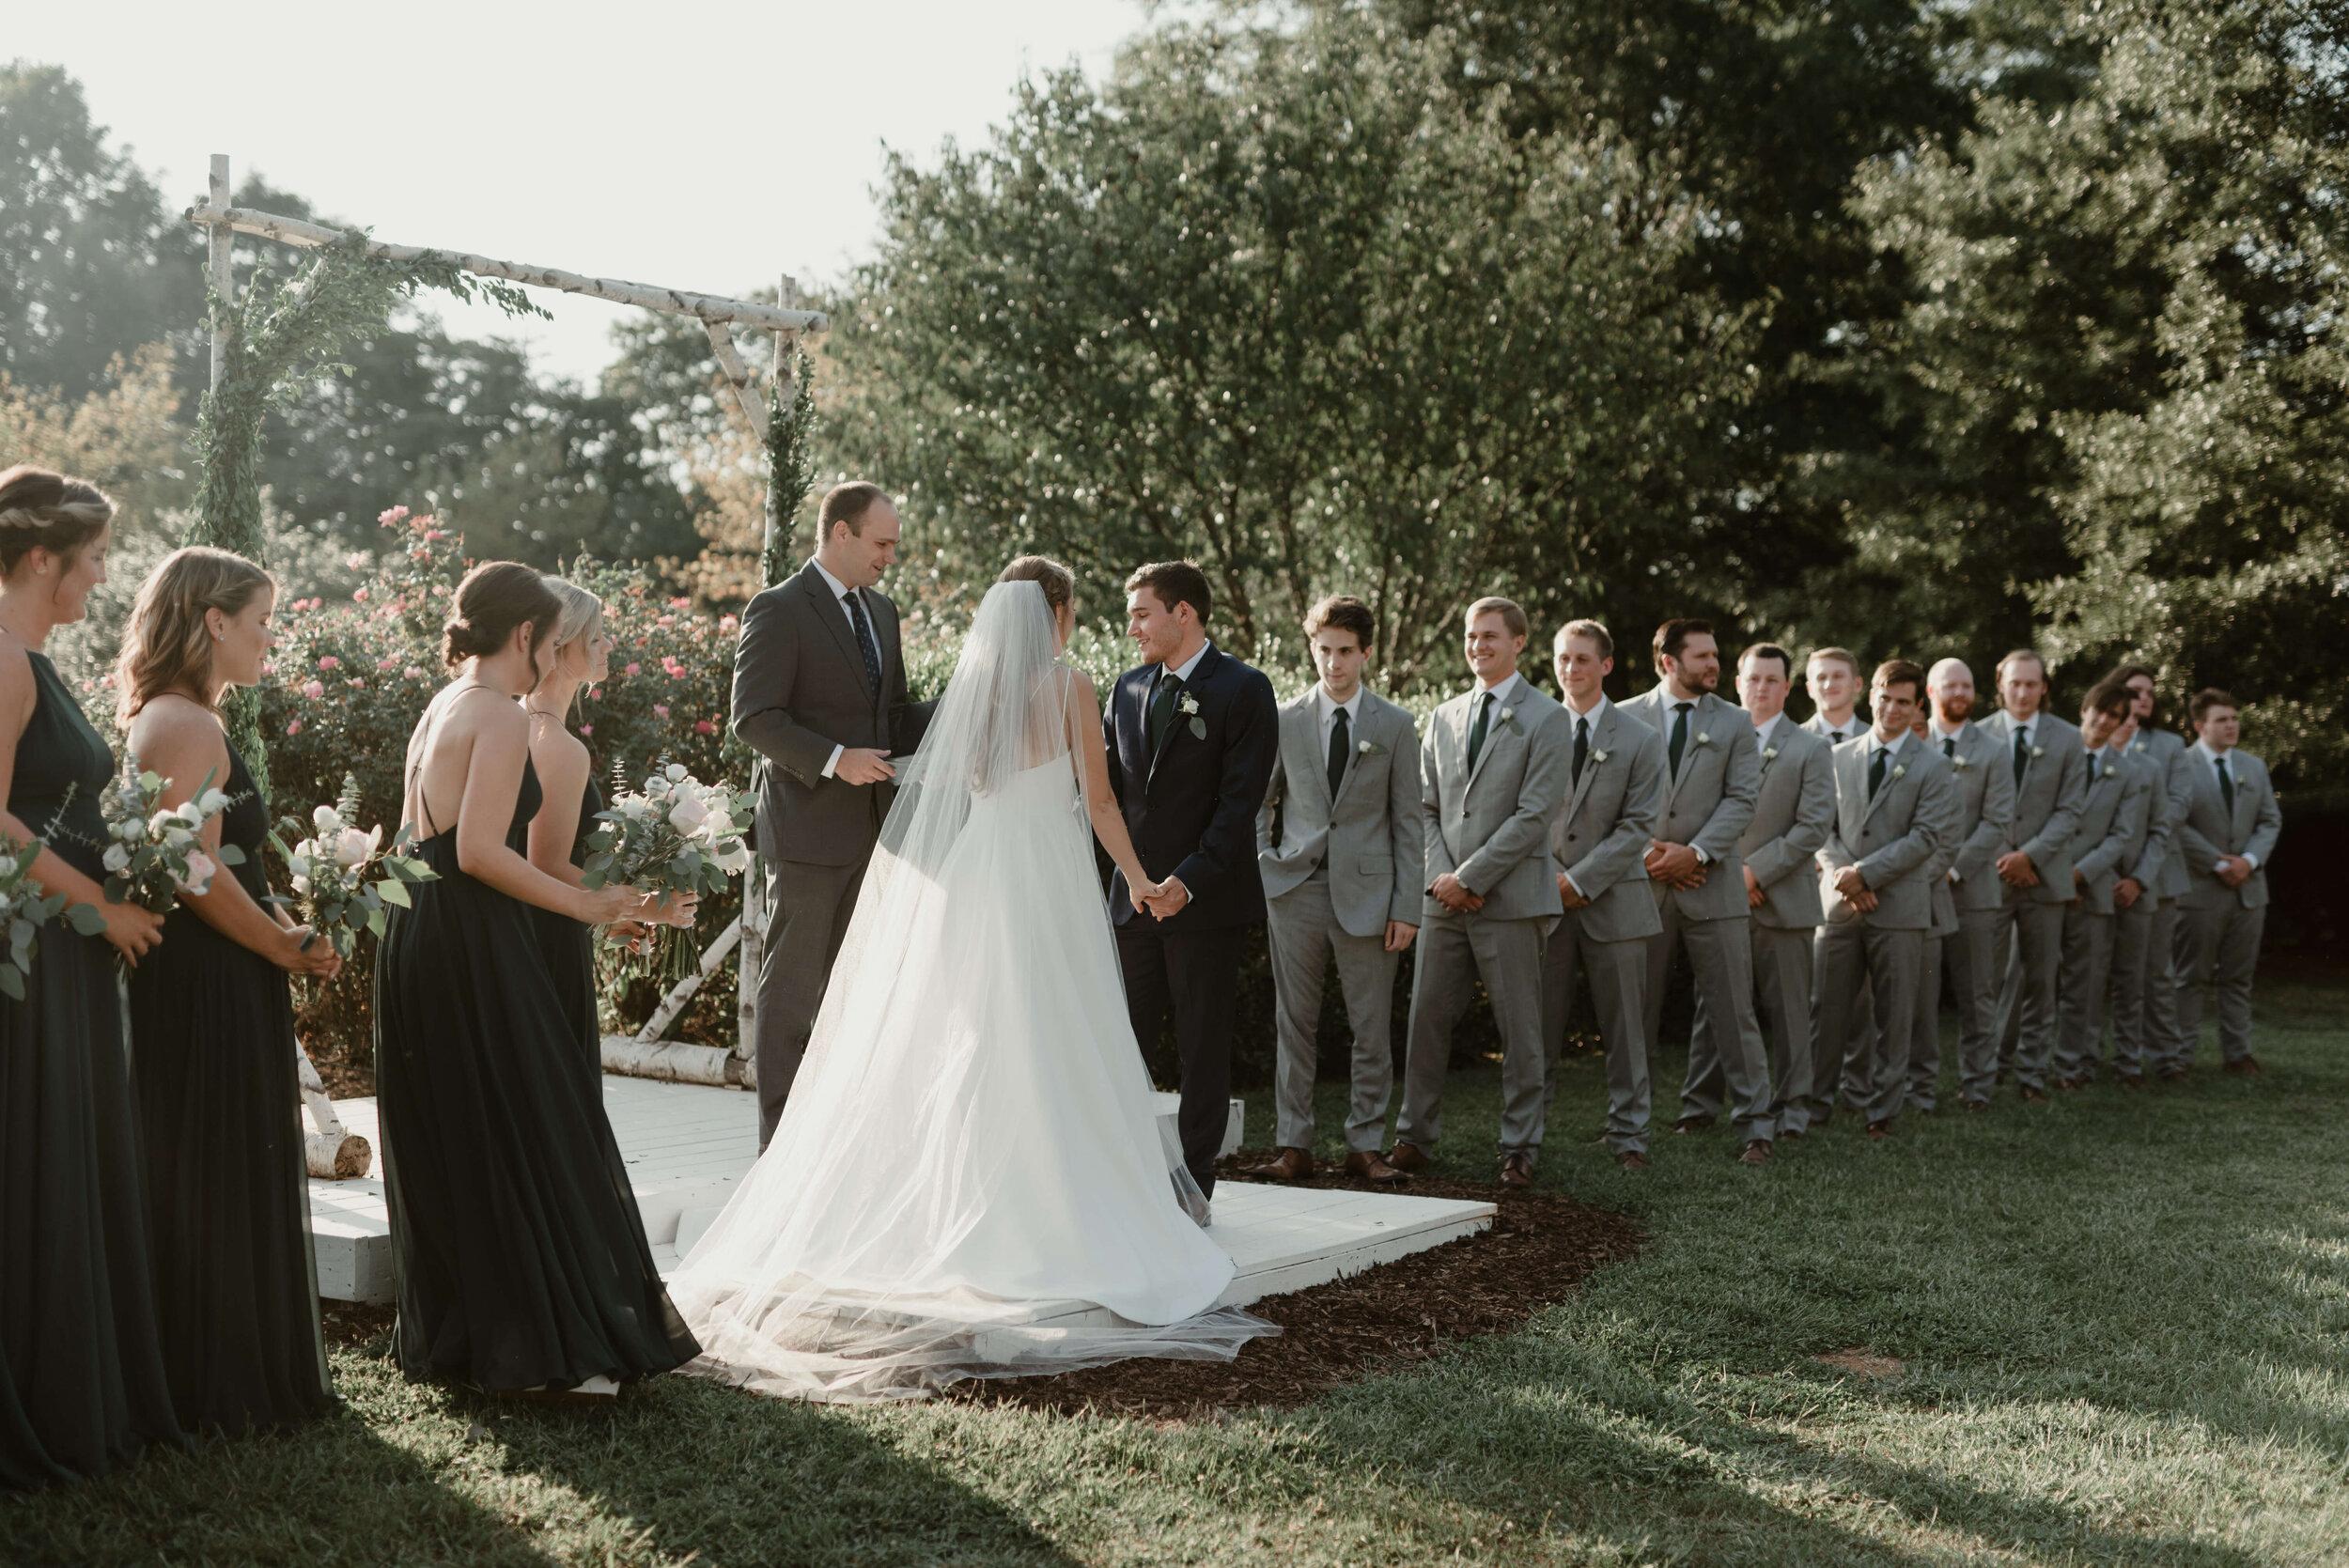 RALEIGH_WEDDING_GABBY_AND_SMITTYDSC_7678.jpg